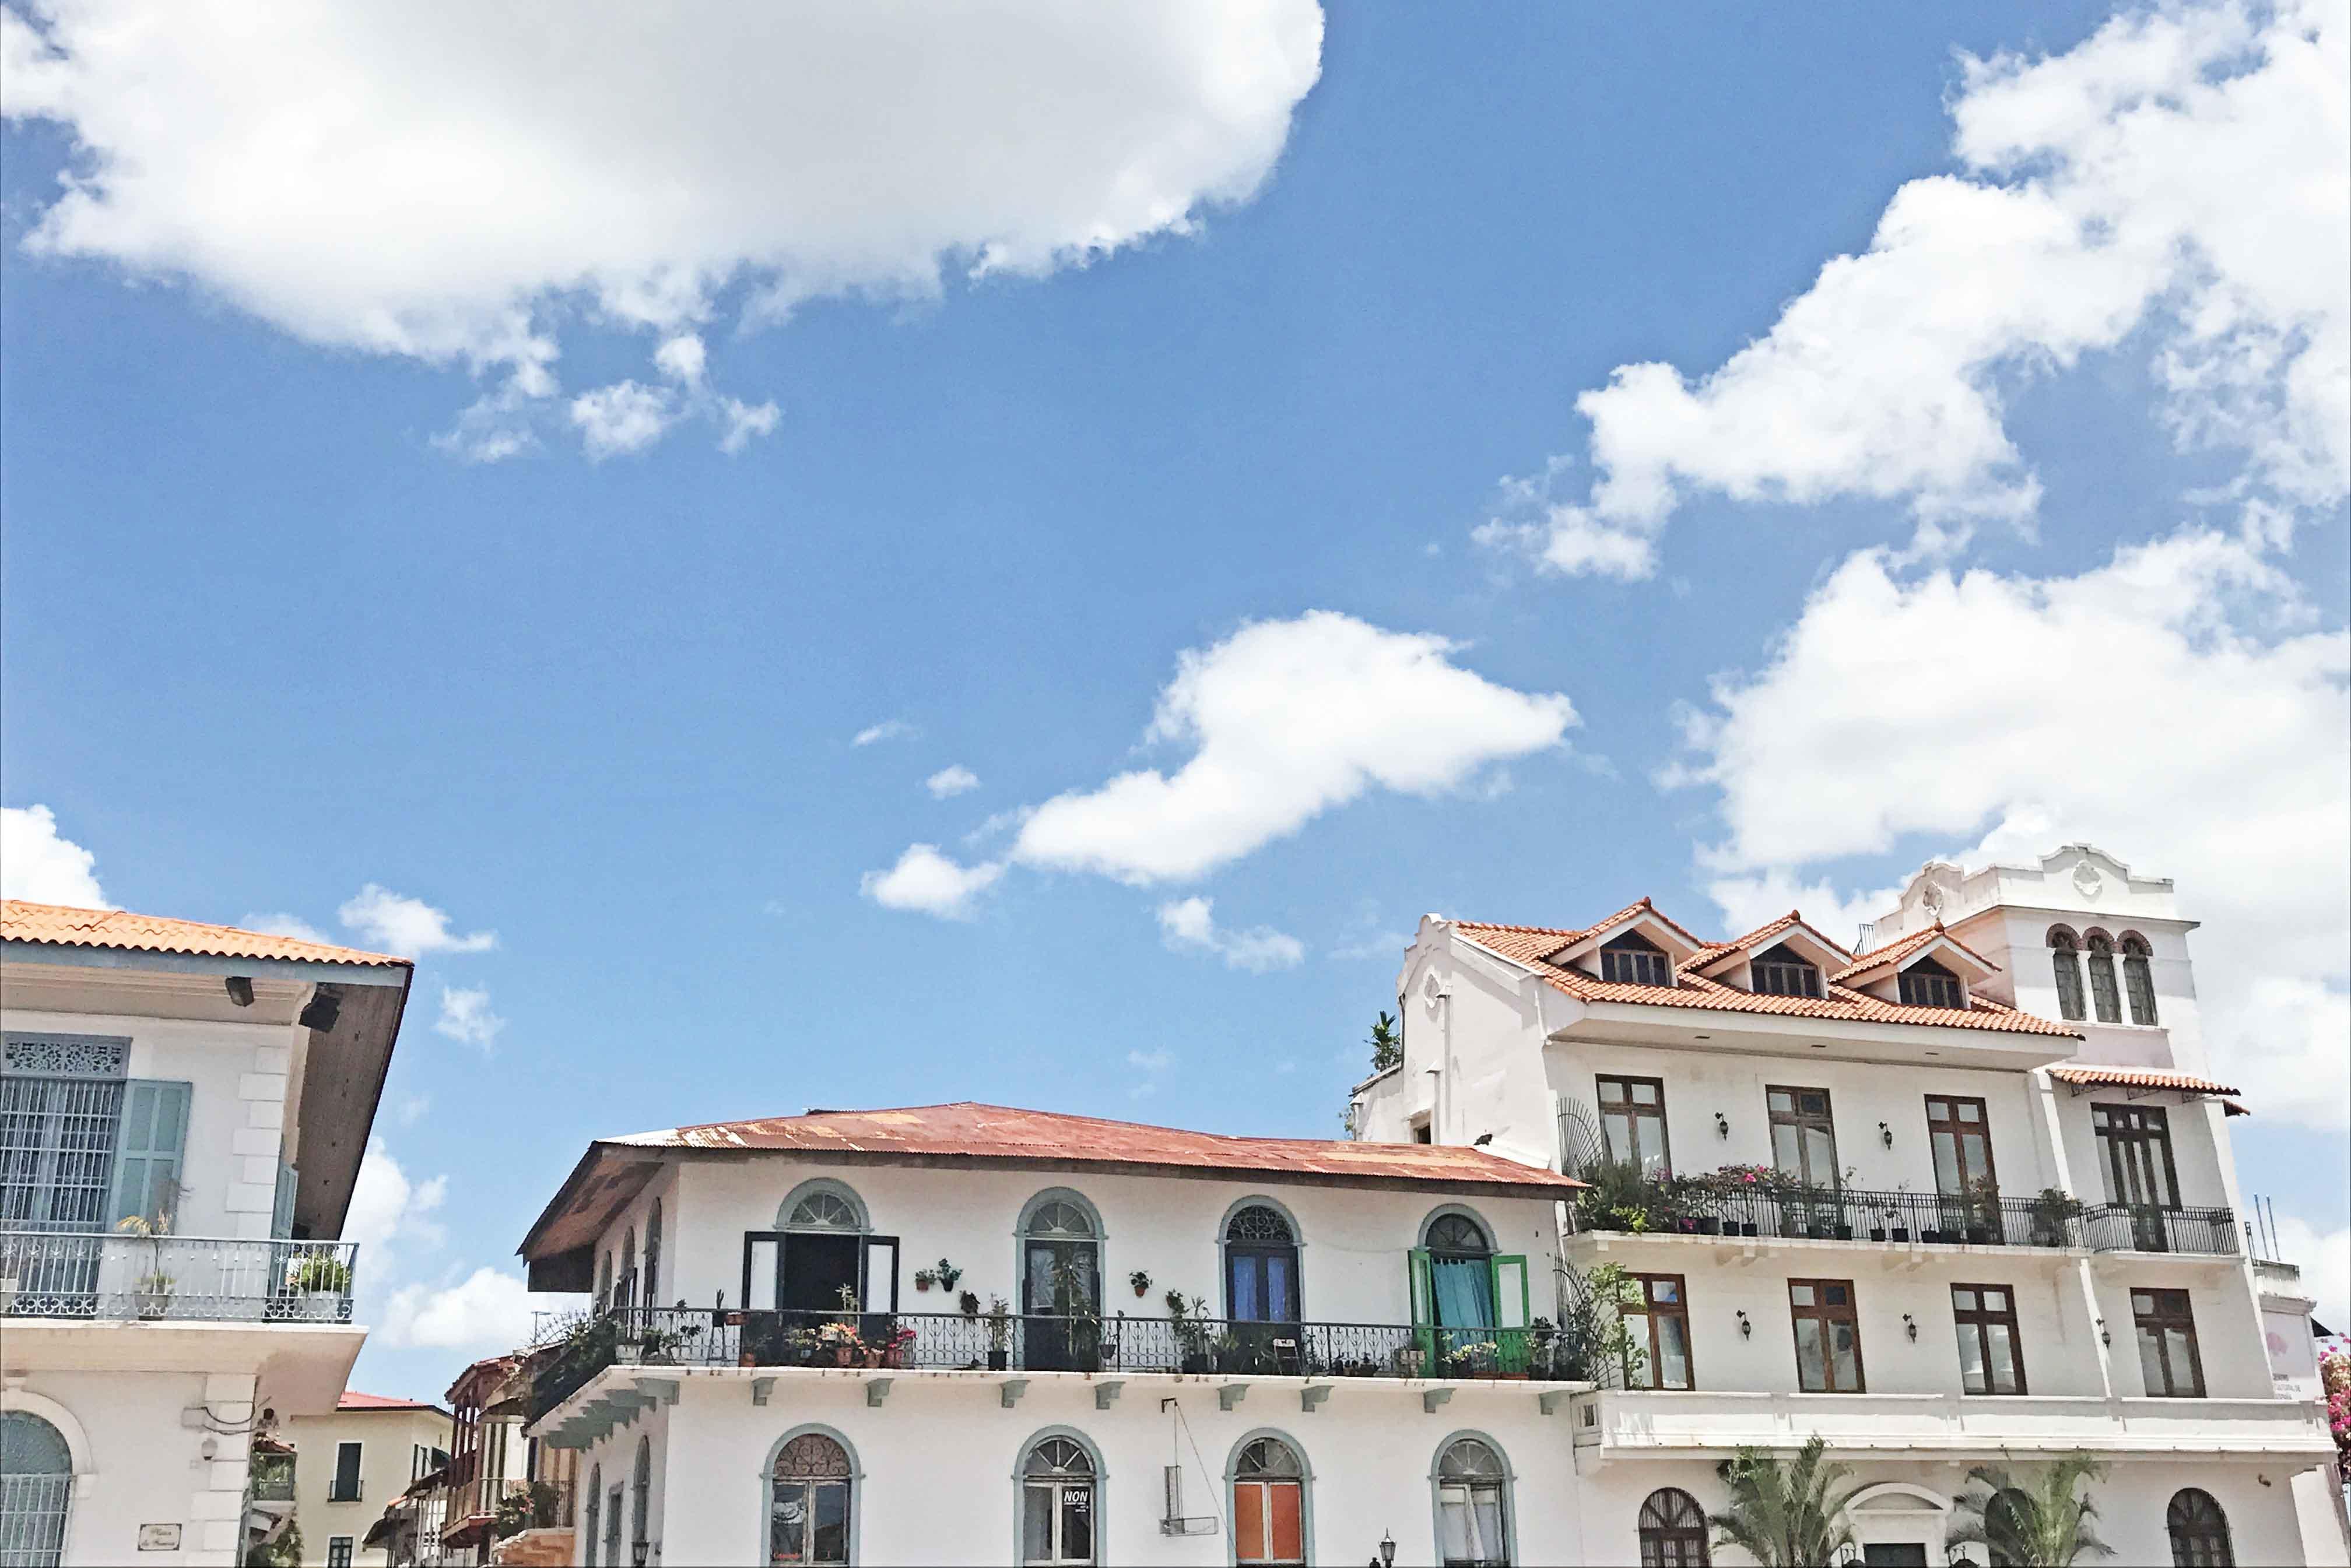 dicas cidade do panama - casco viejo antiguo - lala rebelo